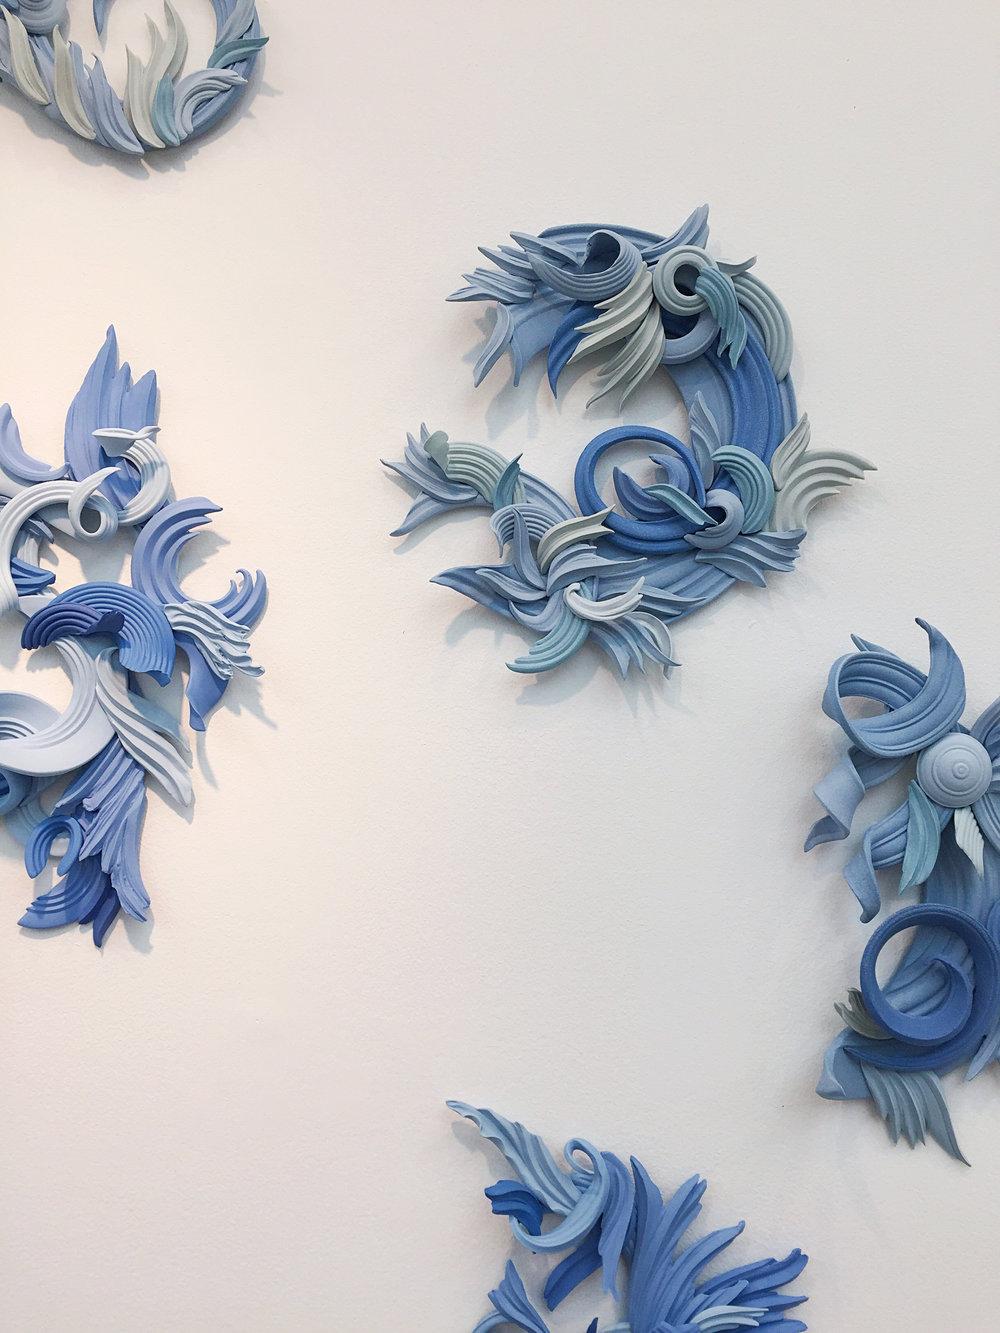 Jo Taylor at Cynthia Corbett Gallery